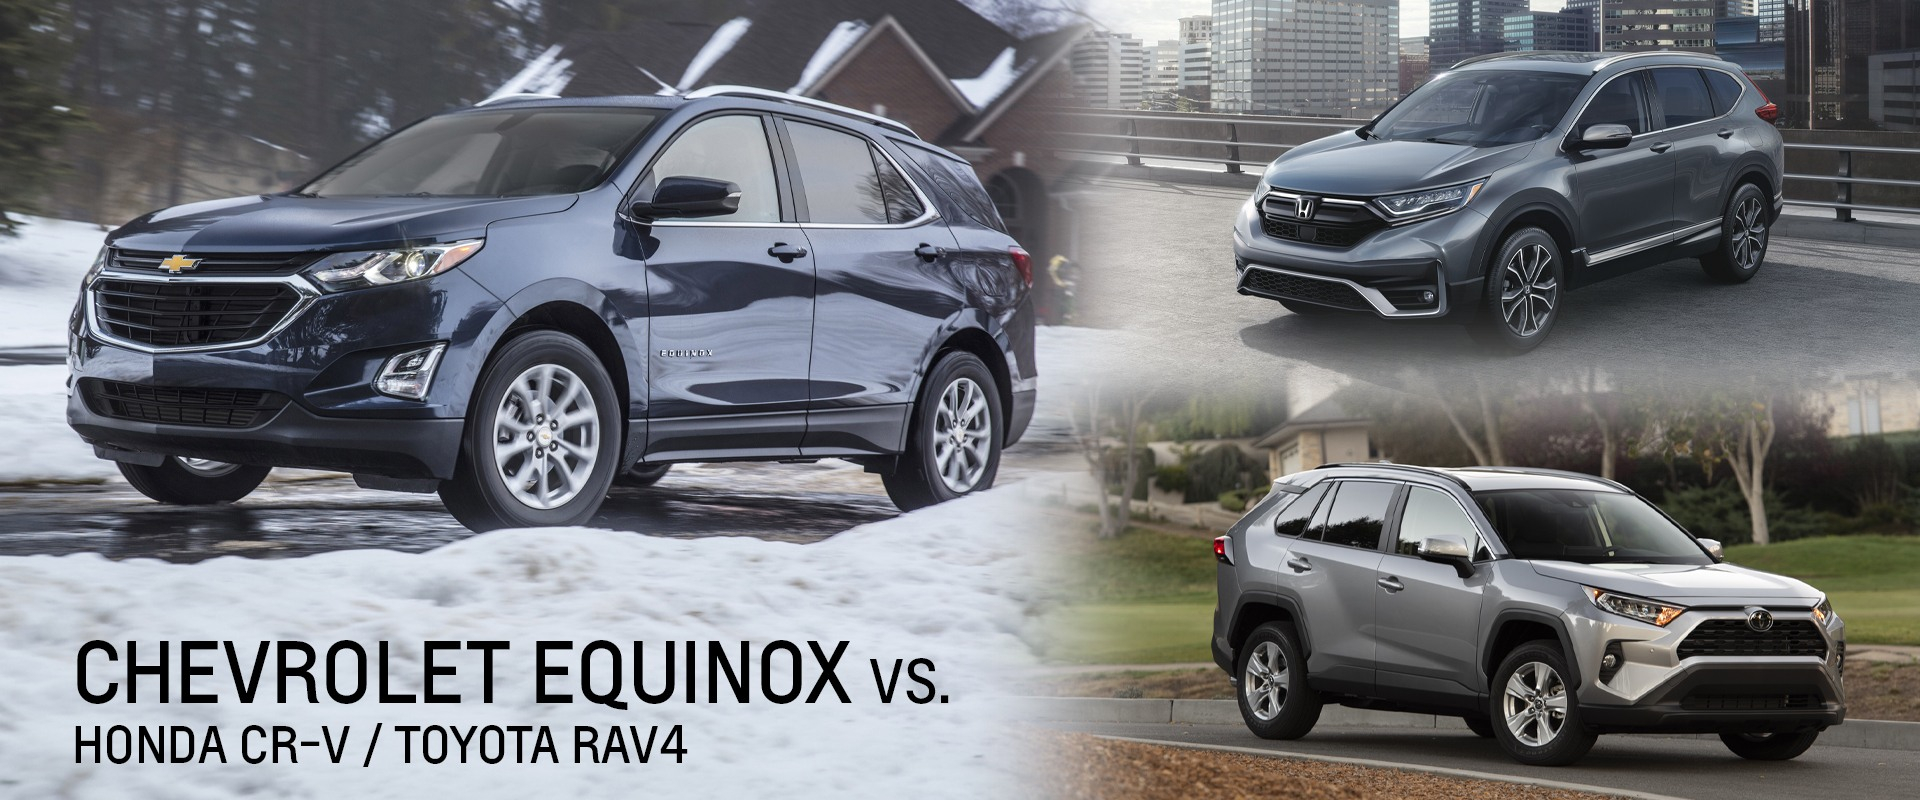 Chevrolet Equinox vs Honda CR-V vs Toyota Rav4